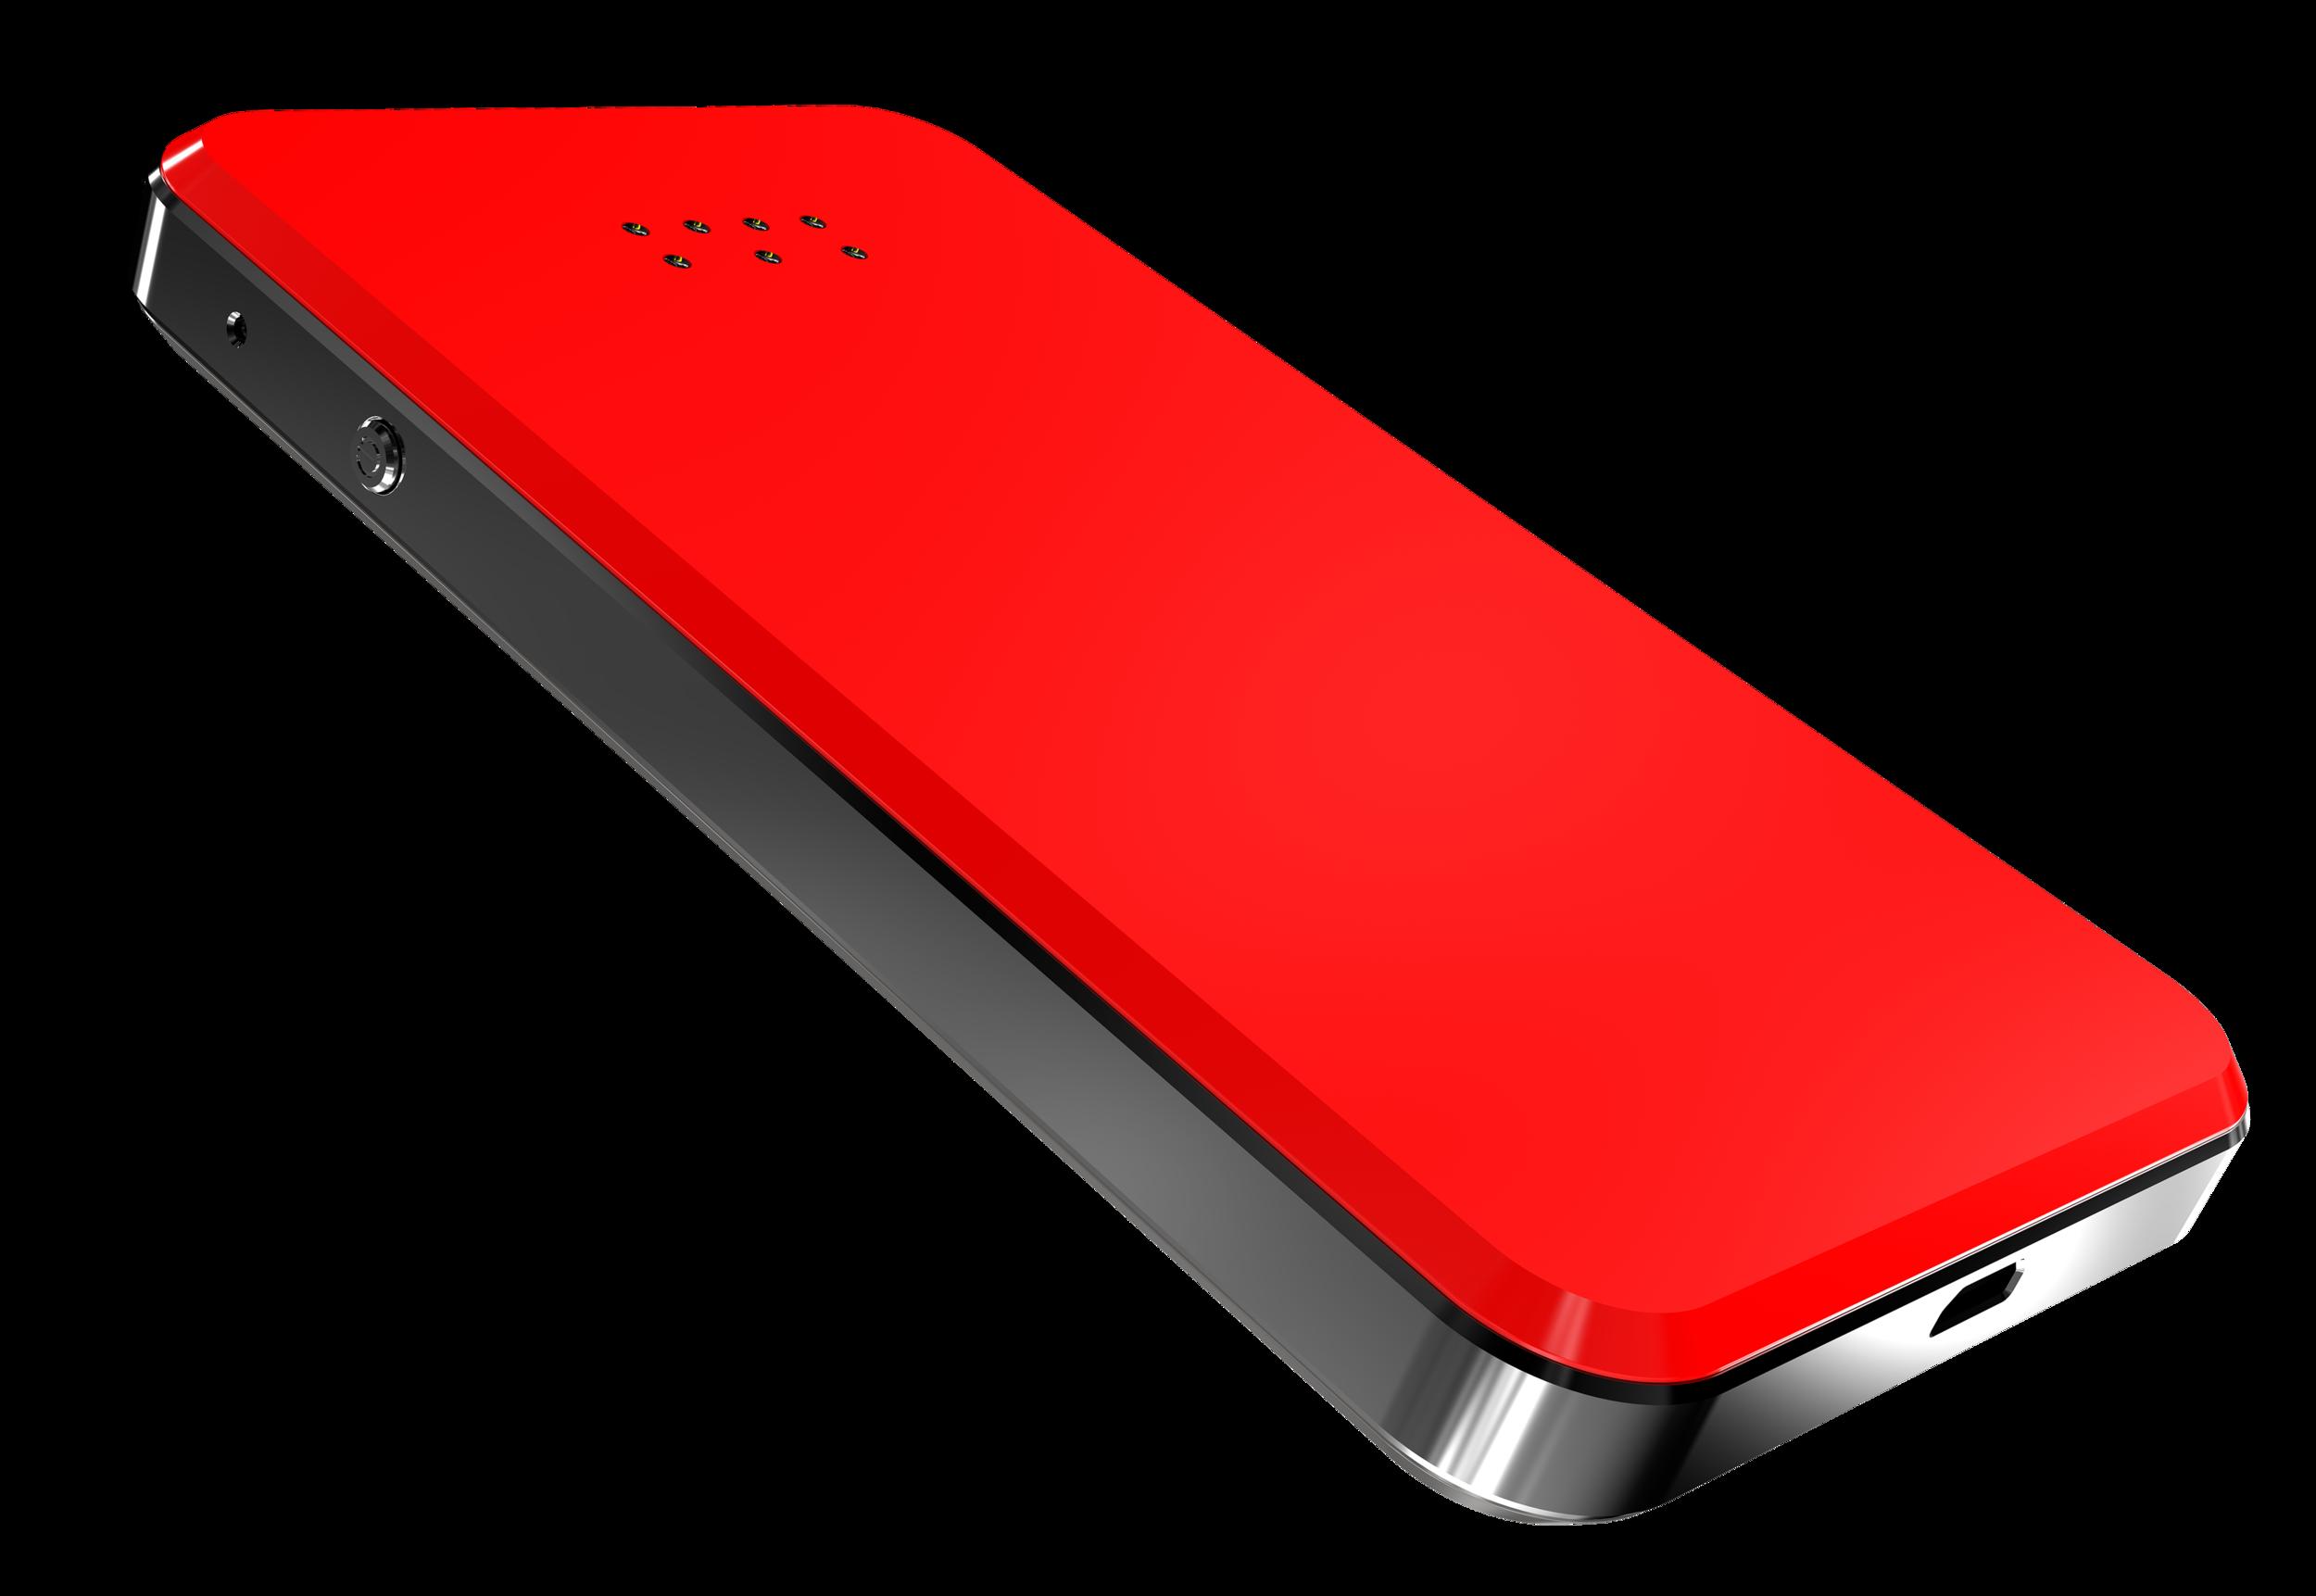 Red Slant BuyArtboard 1.png